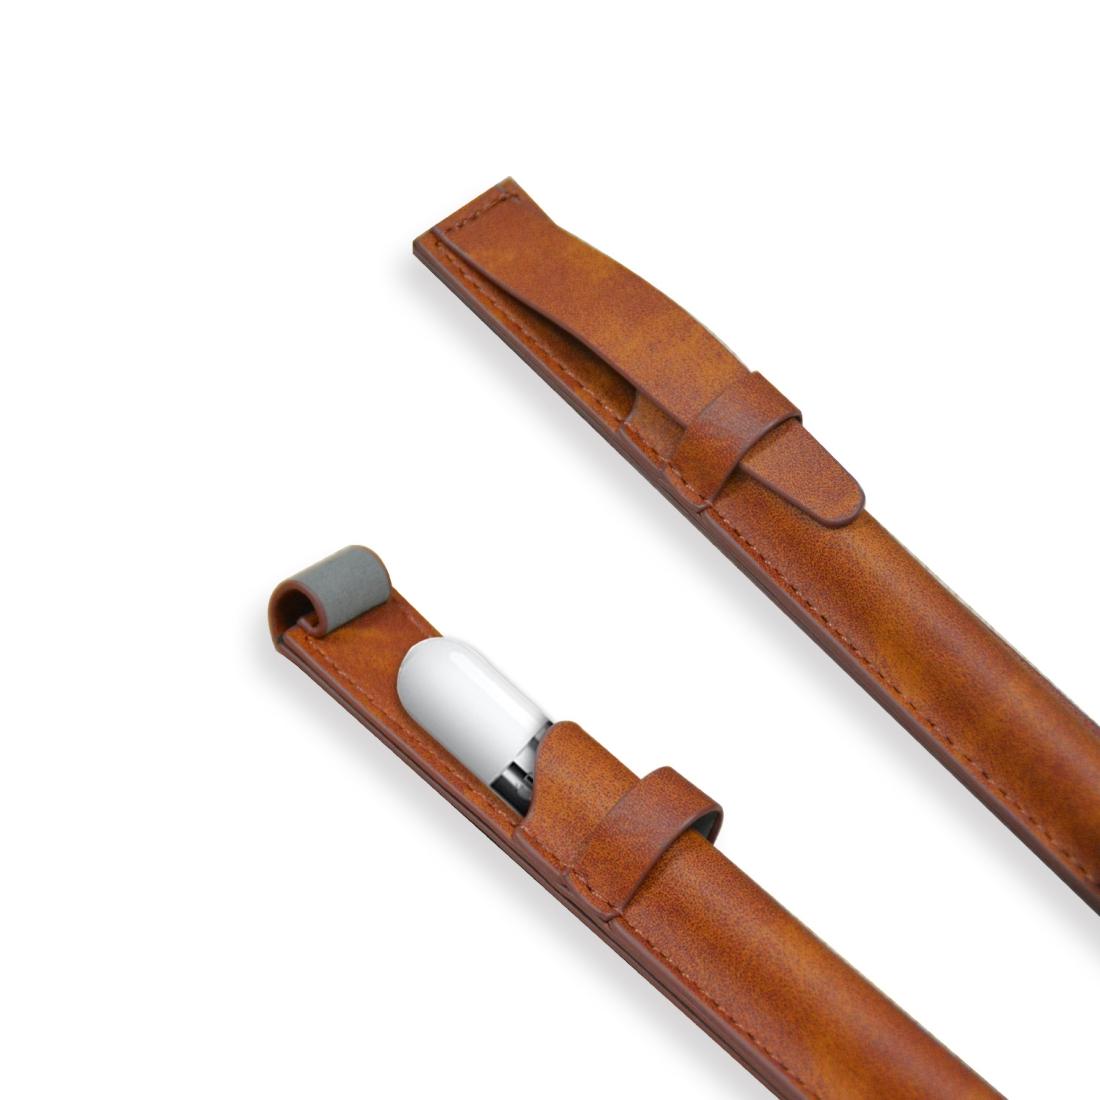 Apple Stylus Pen Protective Case for Apple Pencil (Brown)